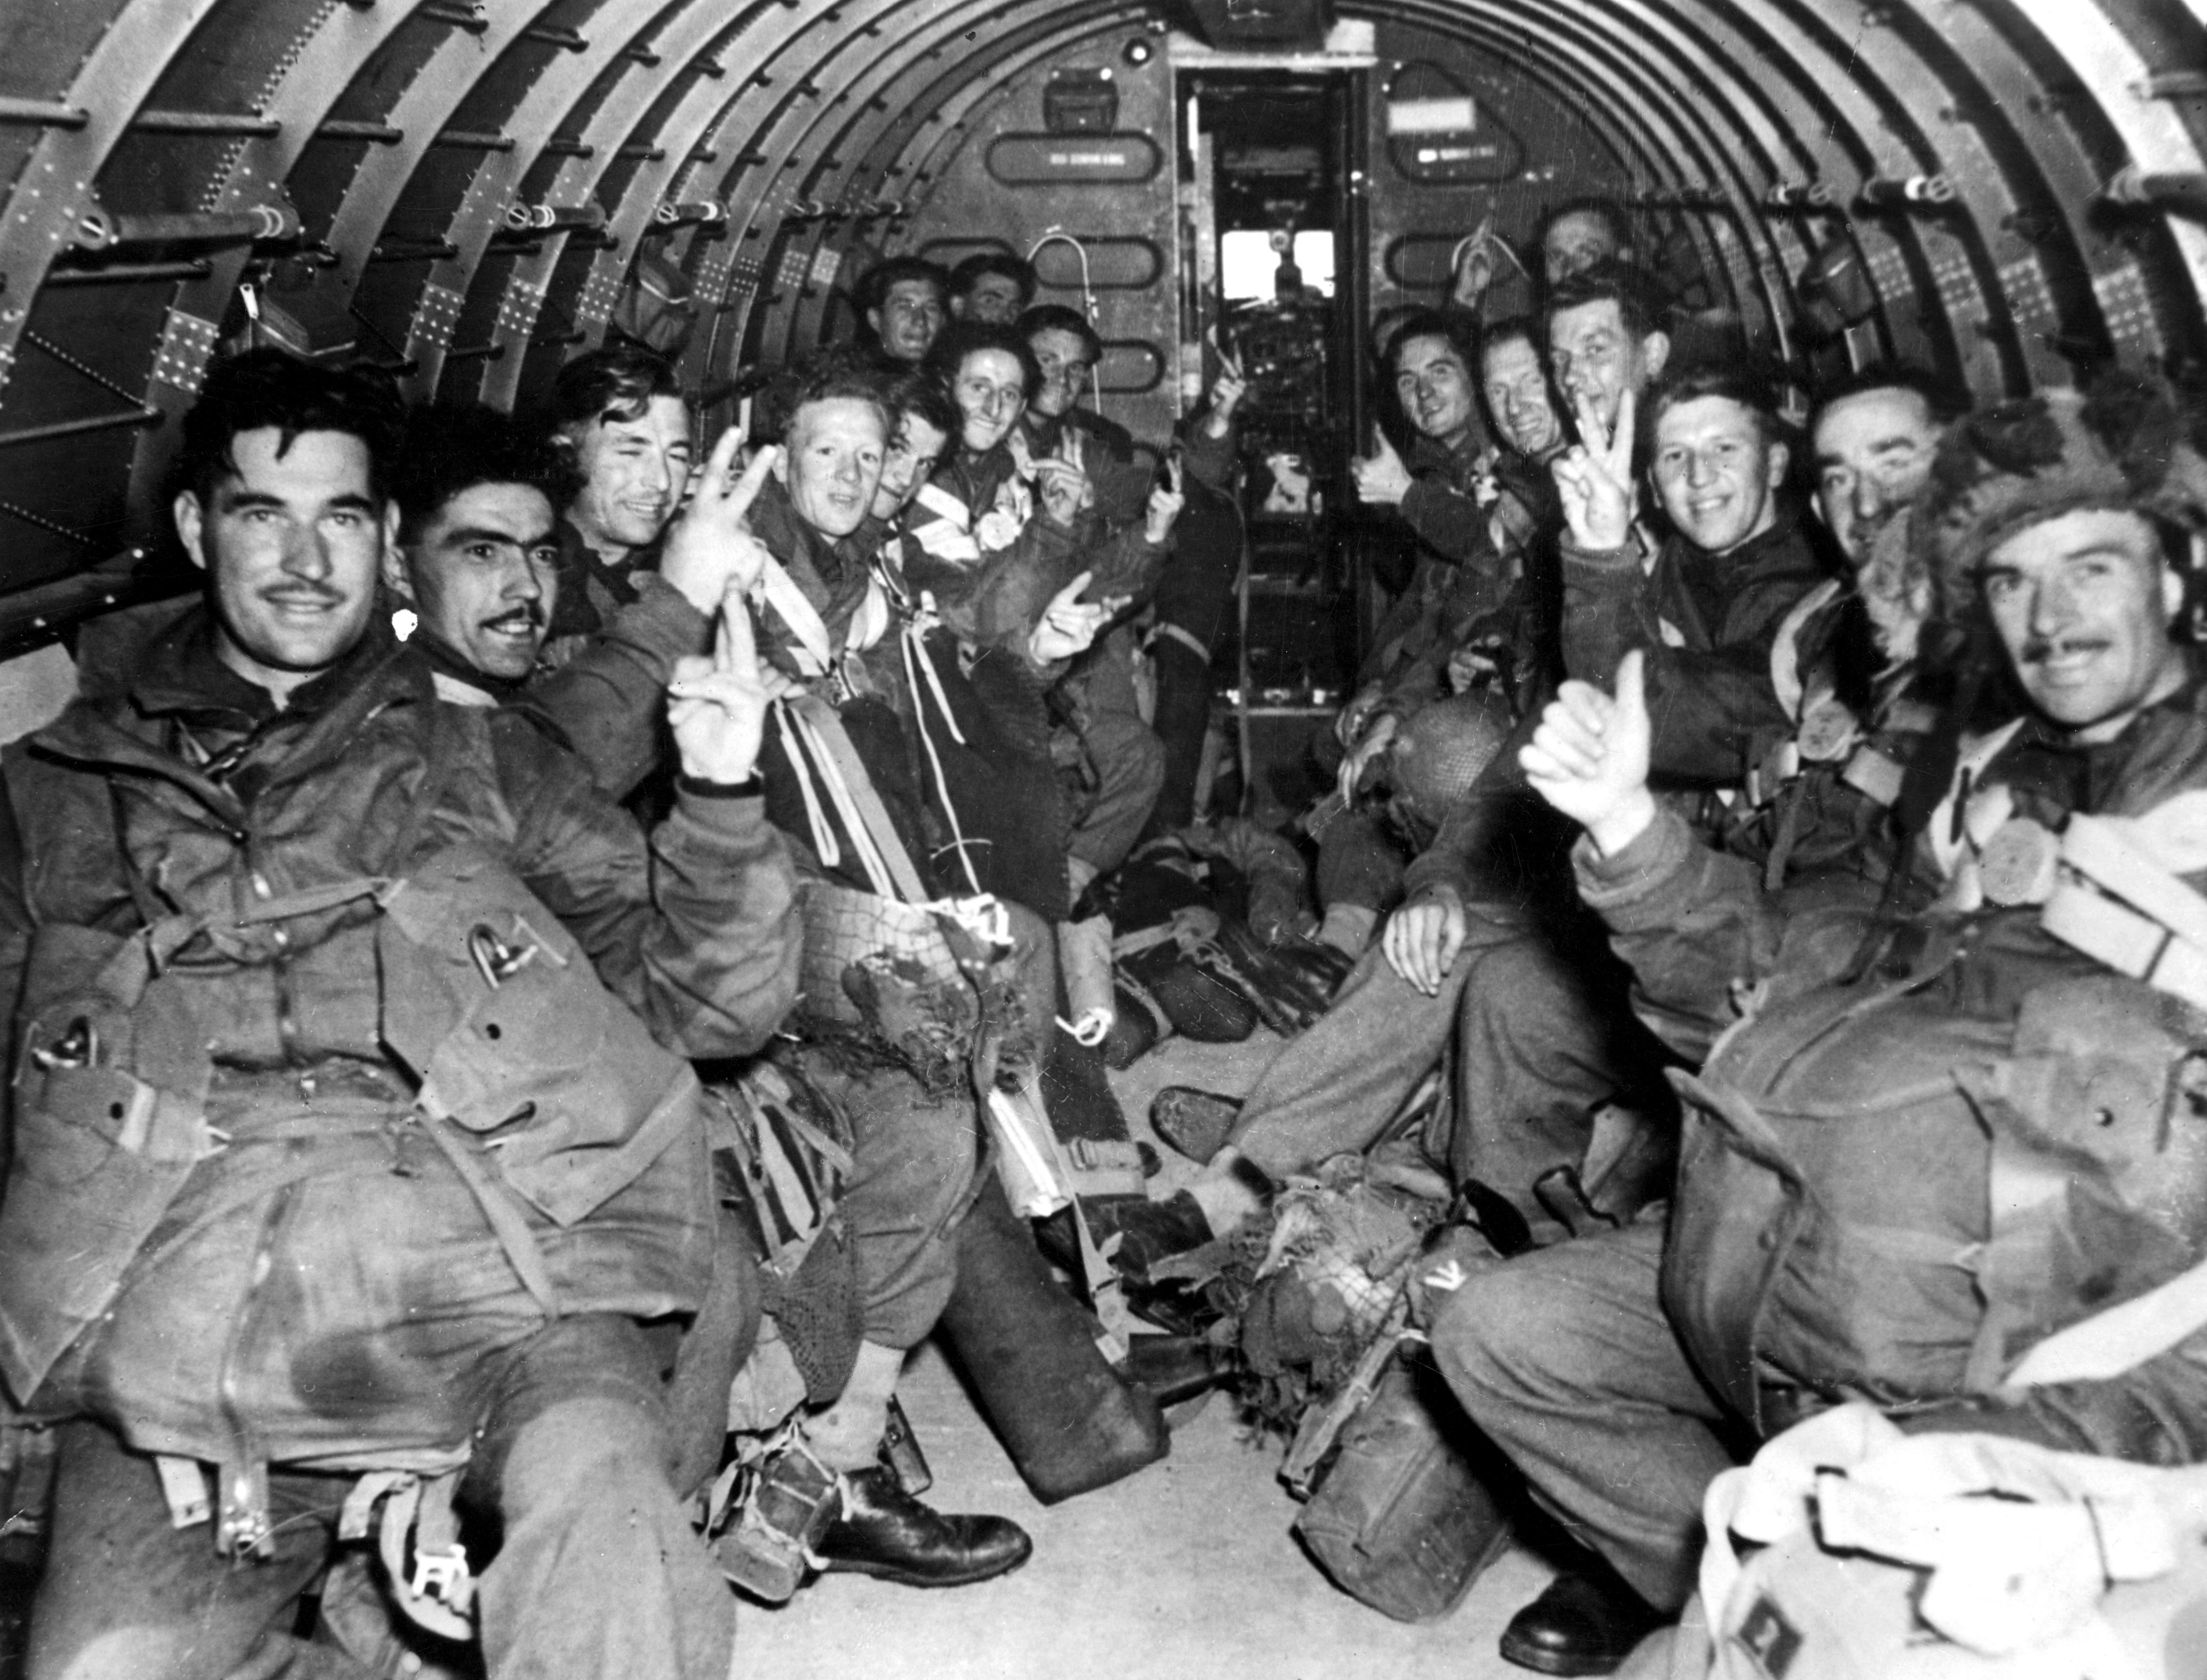 paracaidistasinglesesArnhem.jpg